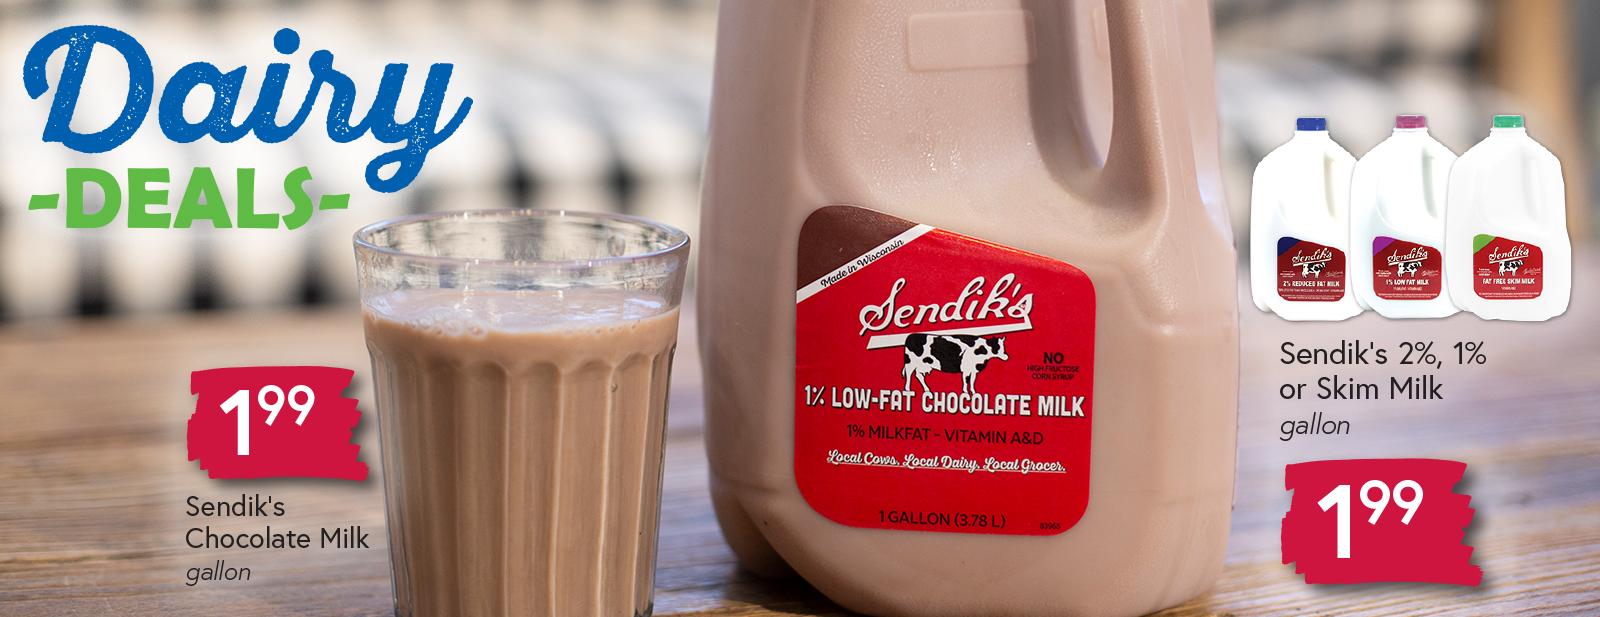 Sendik's 2%, 1% or Skim Milk $1.99 gallon